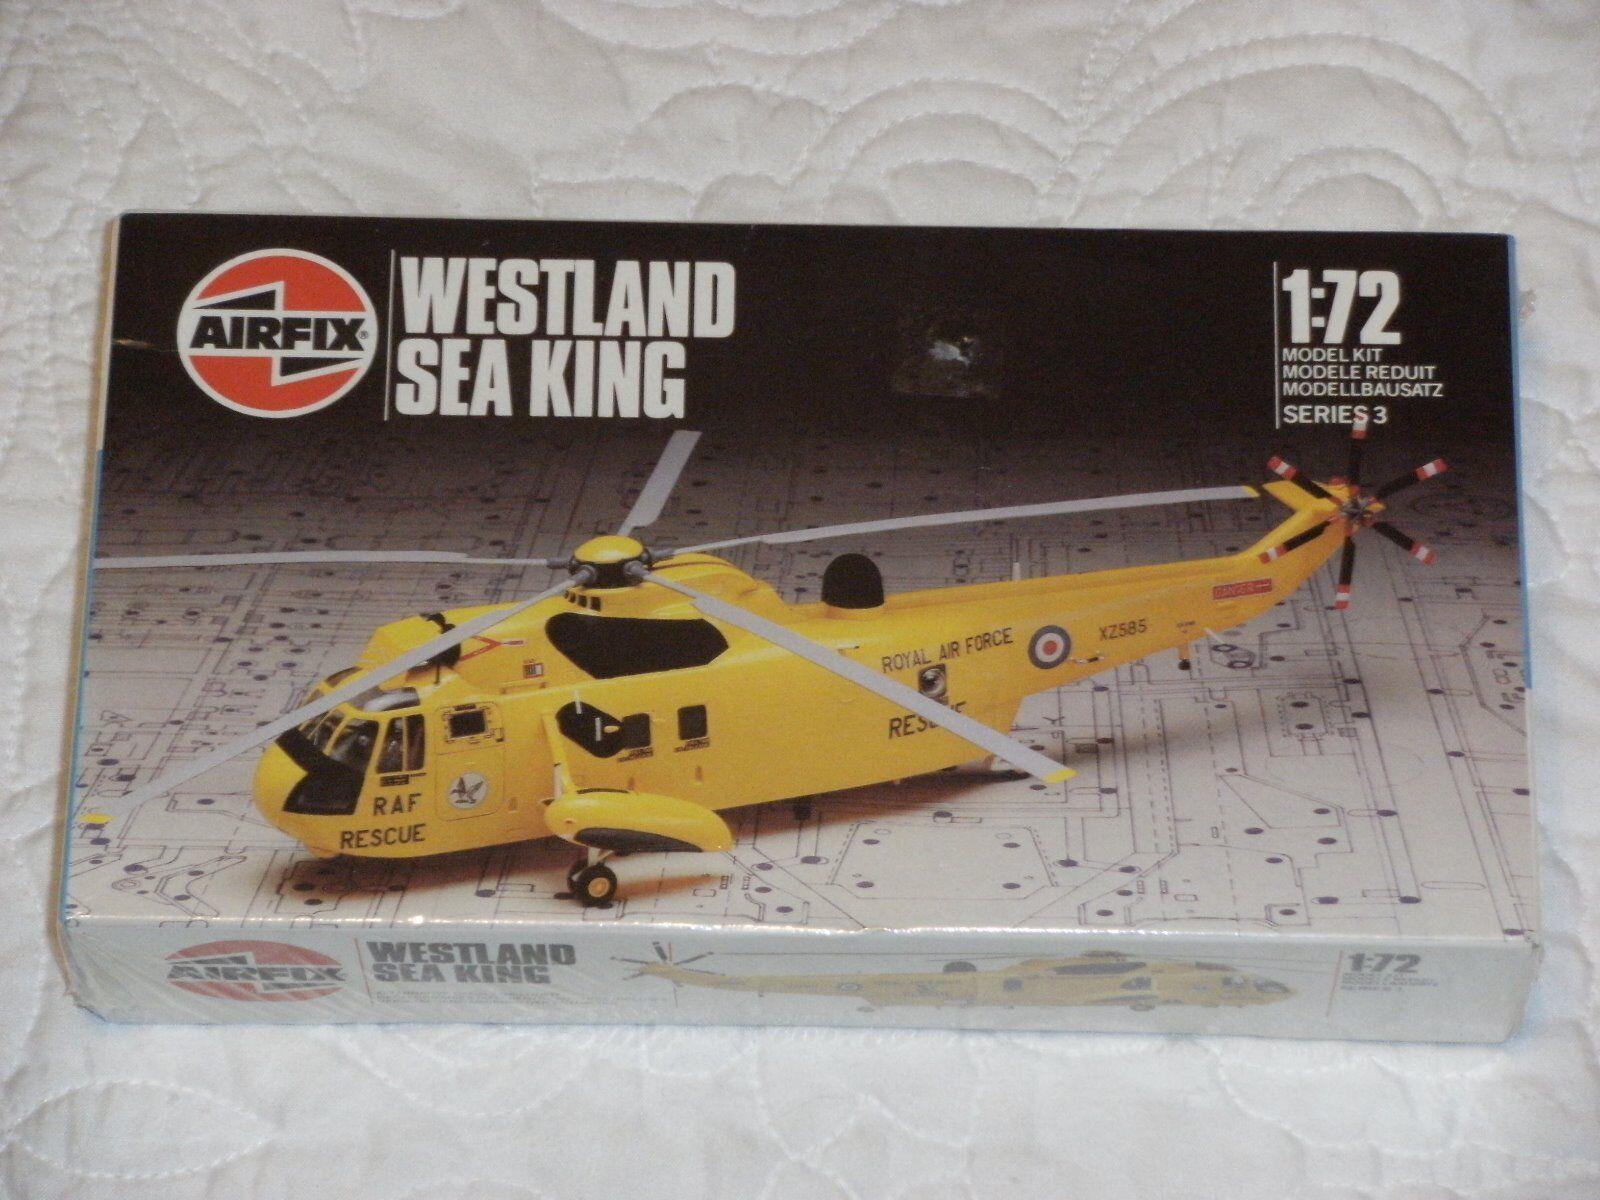 Airfix Westland Sea King 1 72 Scale Model Kit (sealed) Vintage 1986